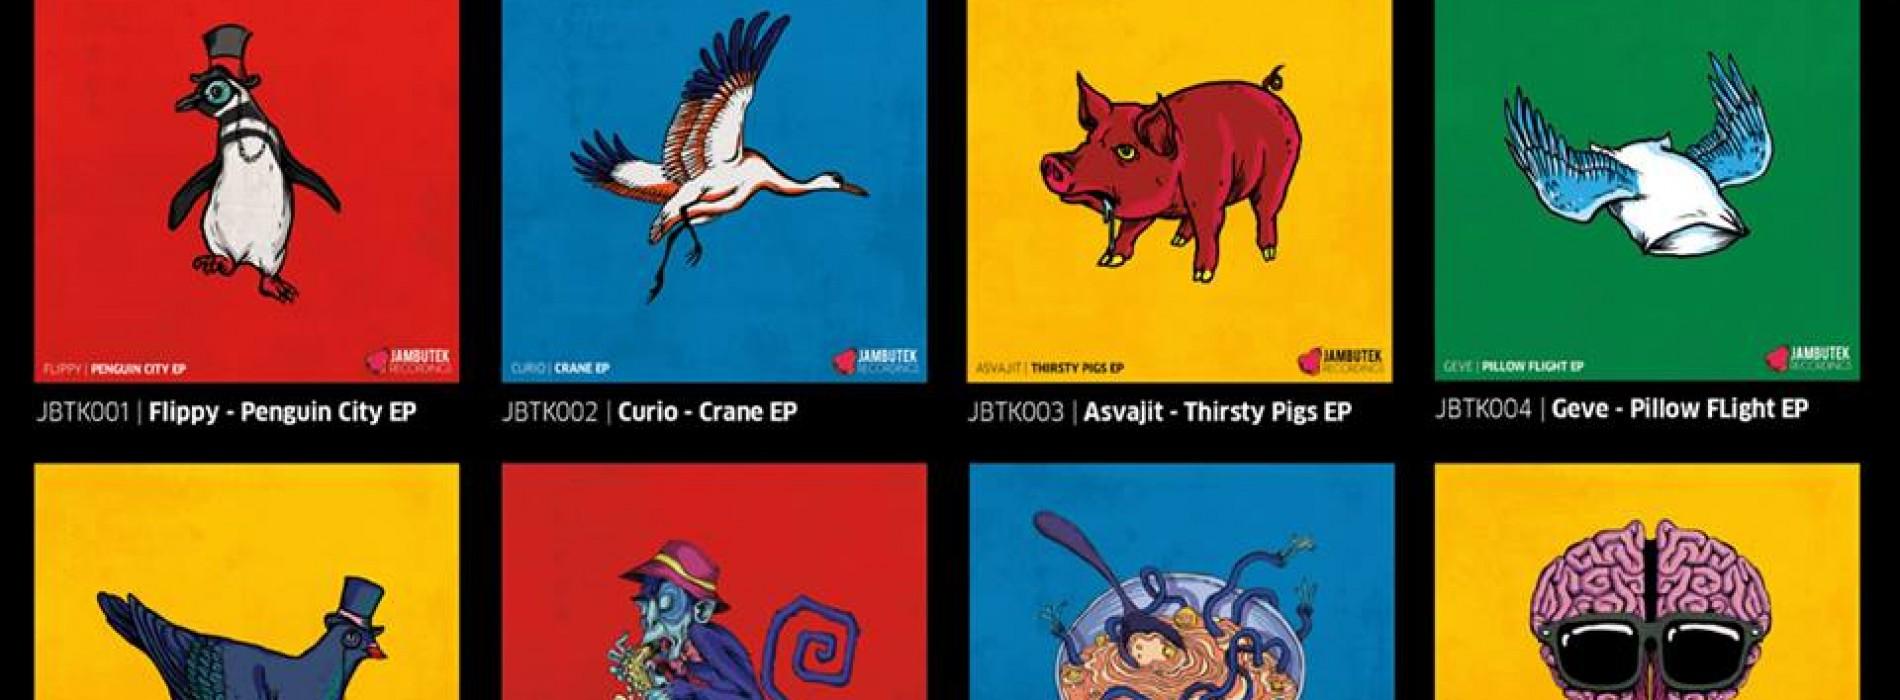 July Releases On Jambutek Records